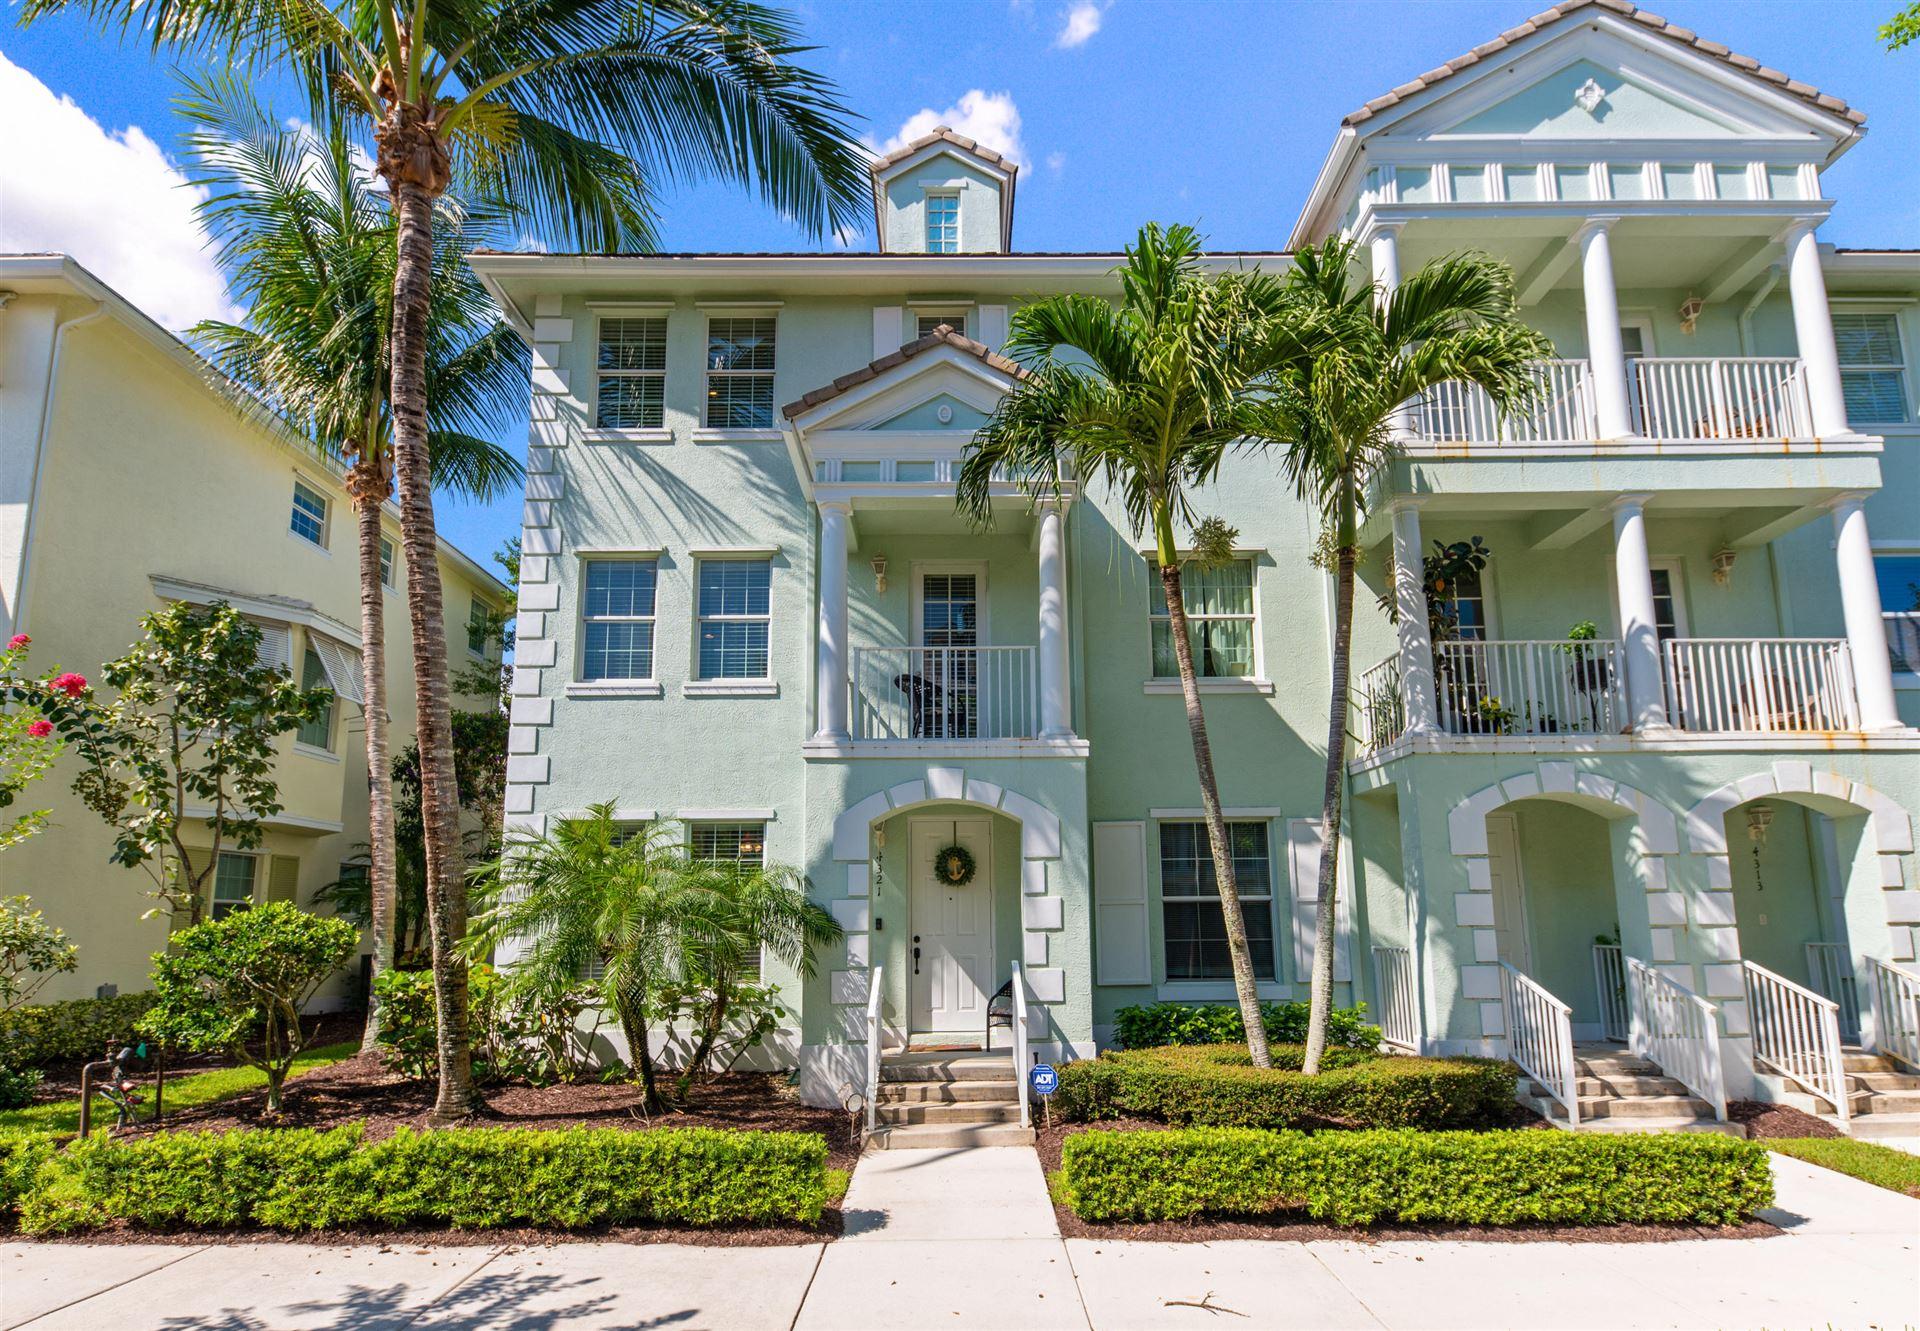 Photo of 4321 Savannah Bay Place, Jupiter, FL 33458 (MLS # RX-10655129)